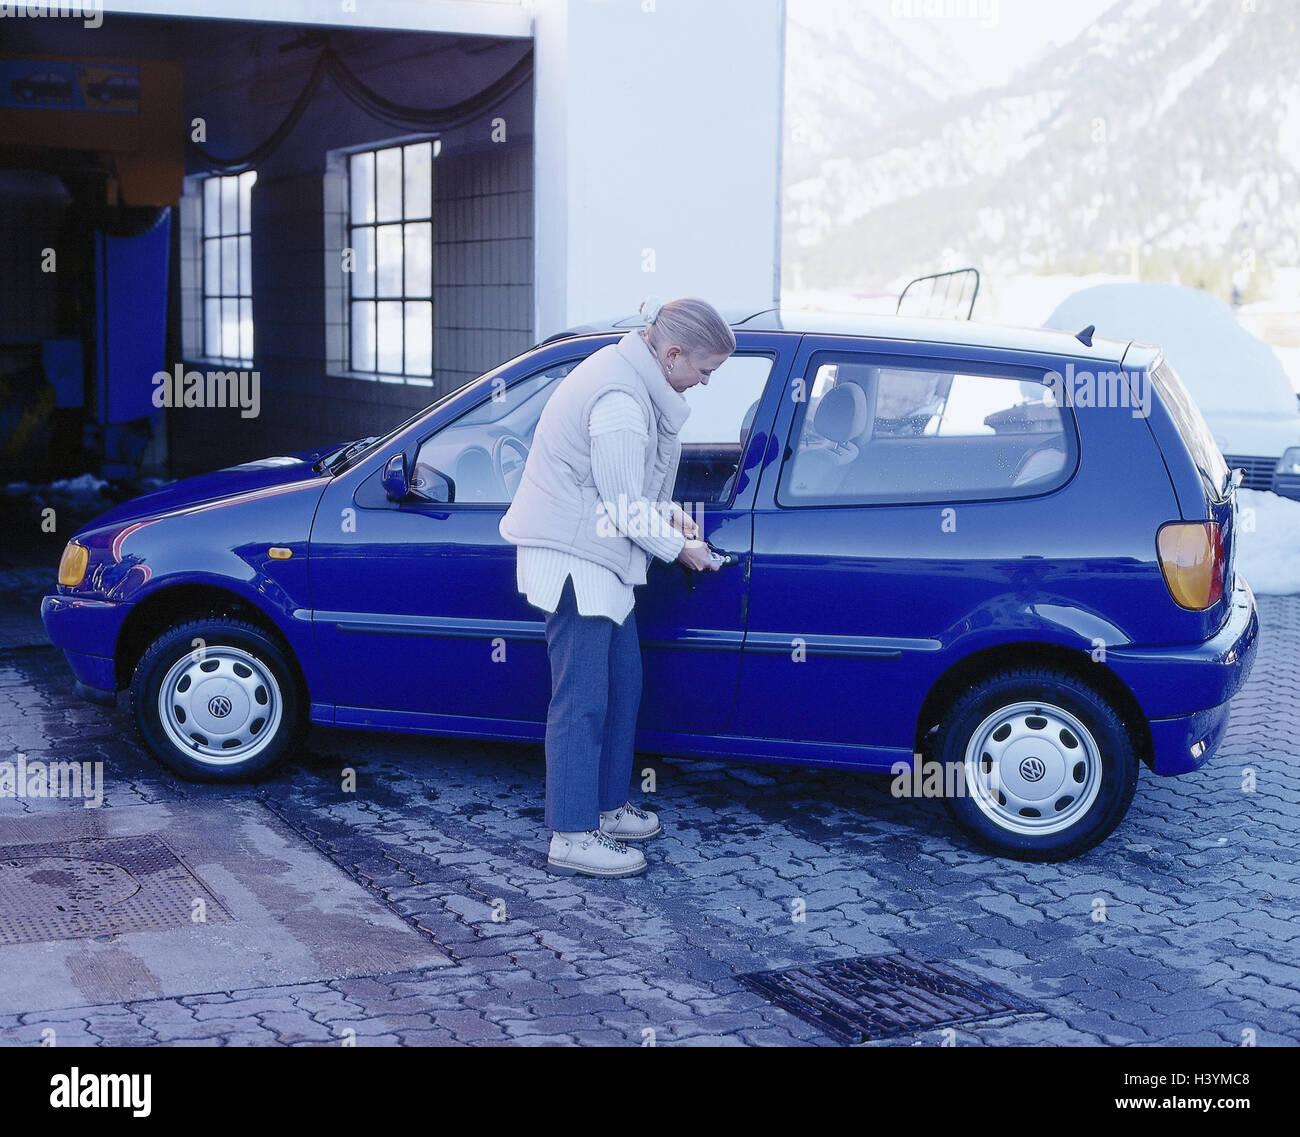 Washing Car In Winter >> Car Wash Car Woman Young Door Lock Defrost Winter